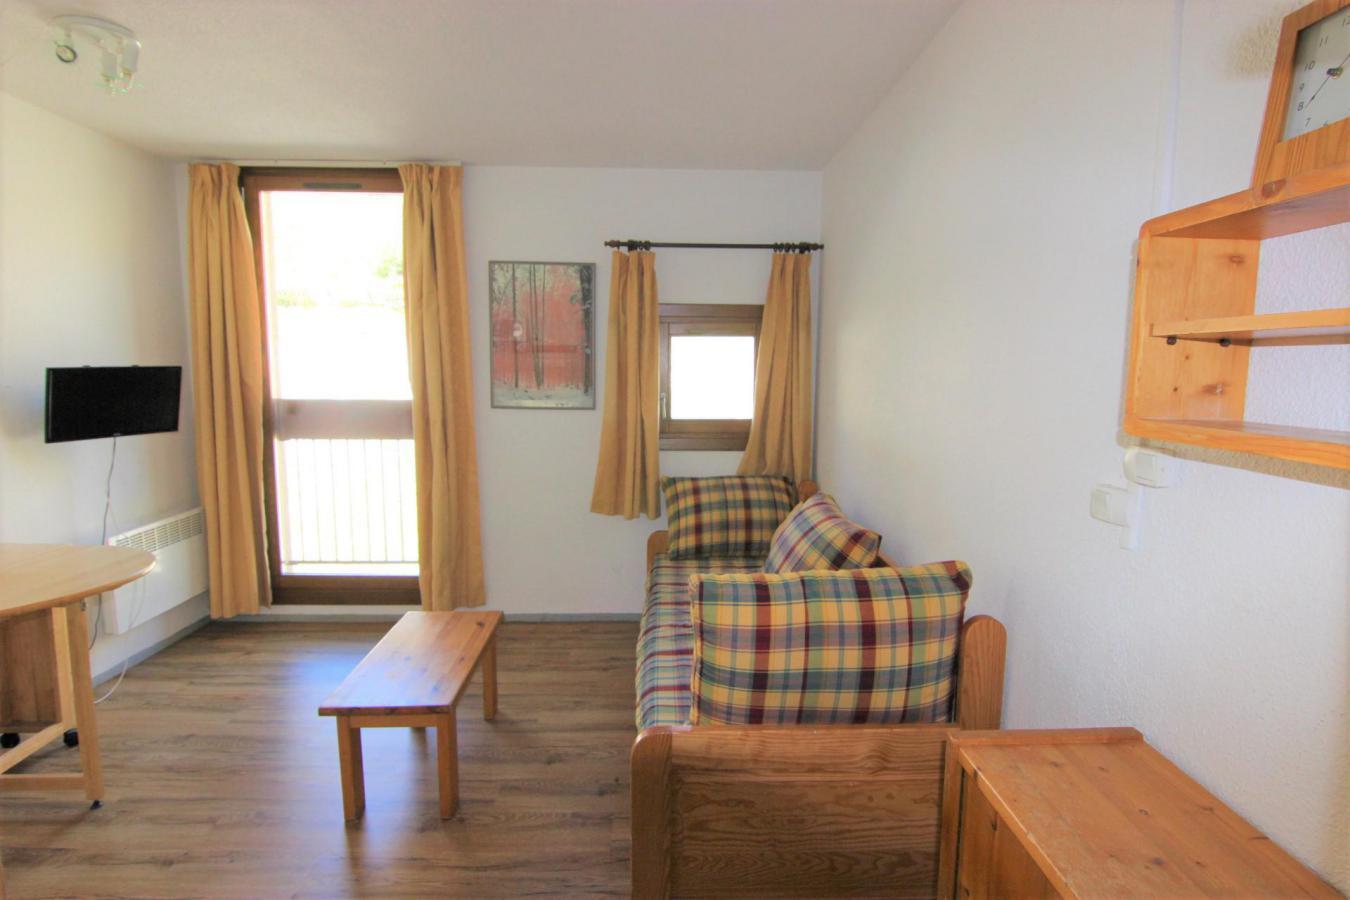 Location au ski Studio 2 personnes (126) - Residence Roche Blanche - Val Thorens - Canapé-gigogne